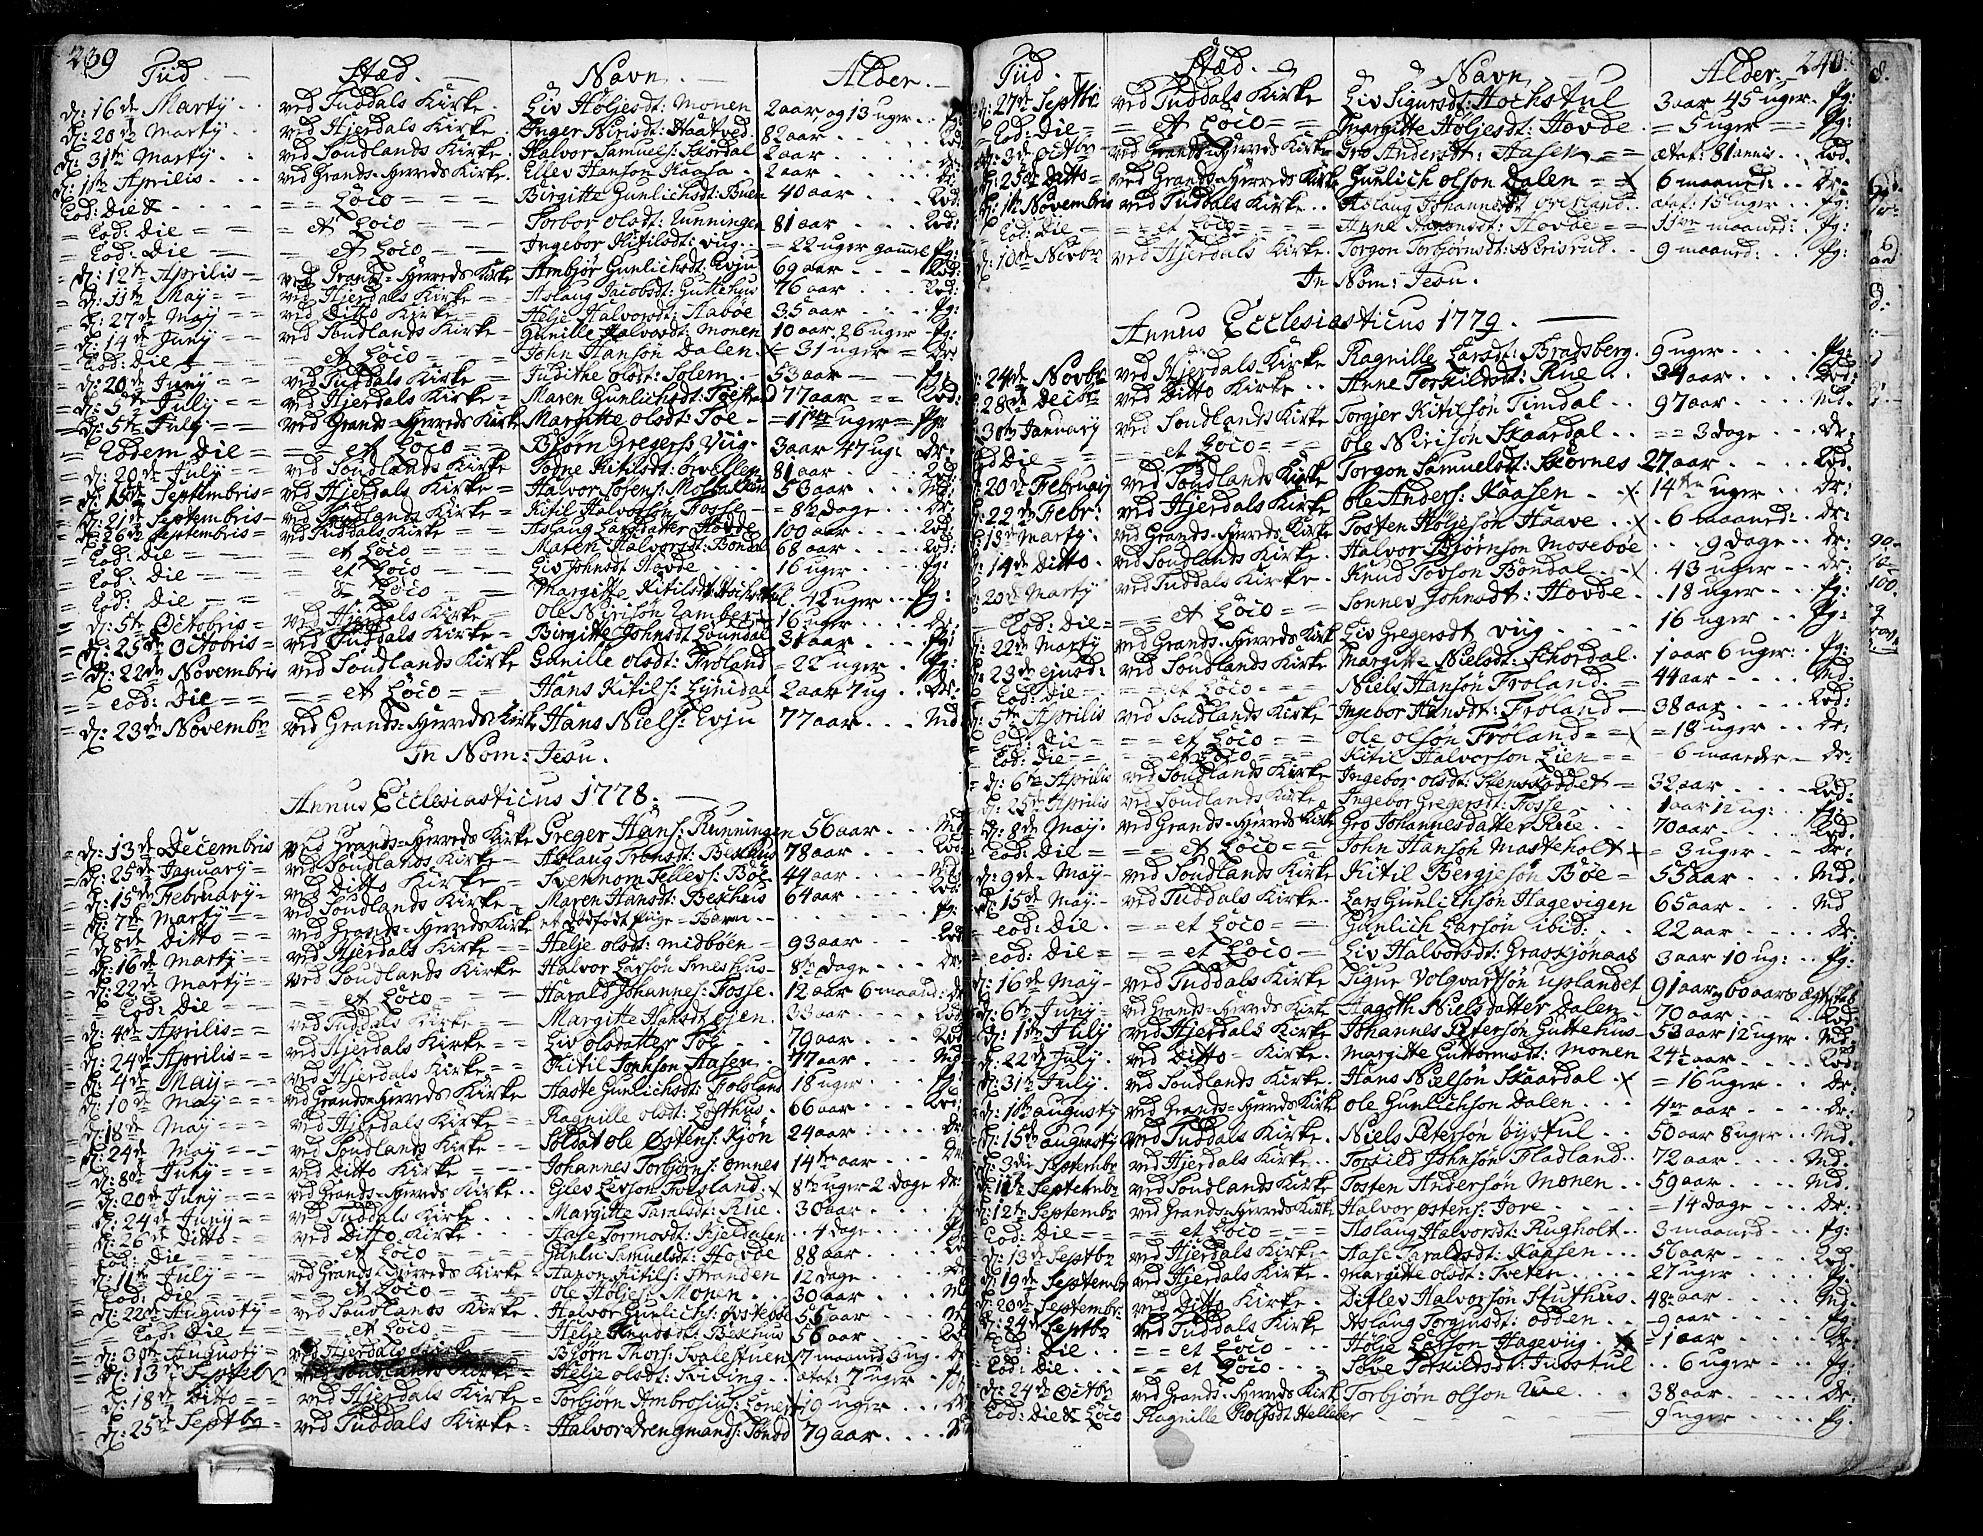 SAKO, Hjartdal kirkebøker, F/Fa/L0005: Ministerialbok nr. I 5, 1776-1801, s. 239-240